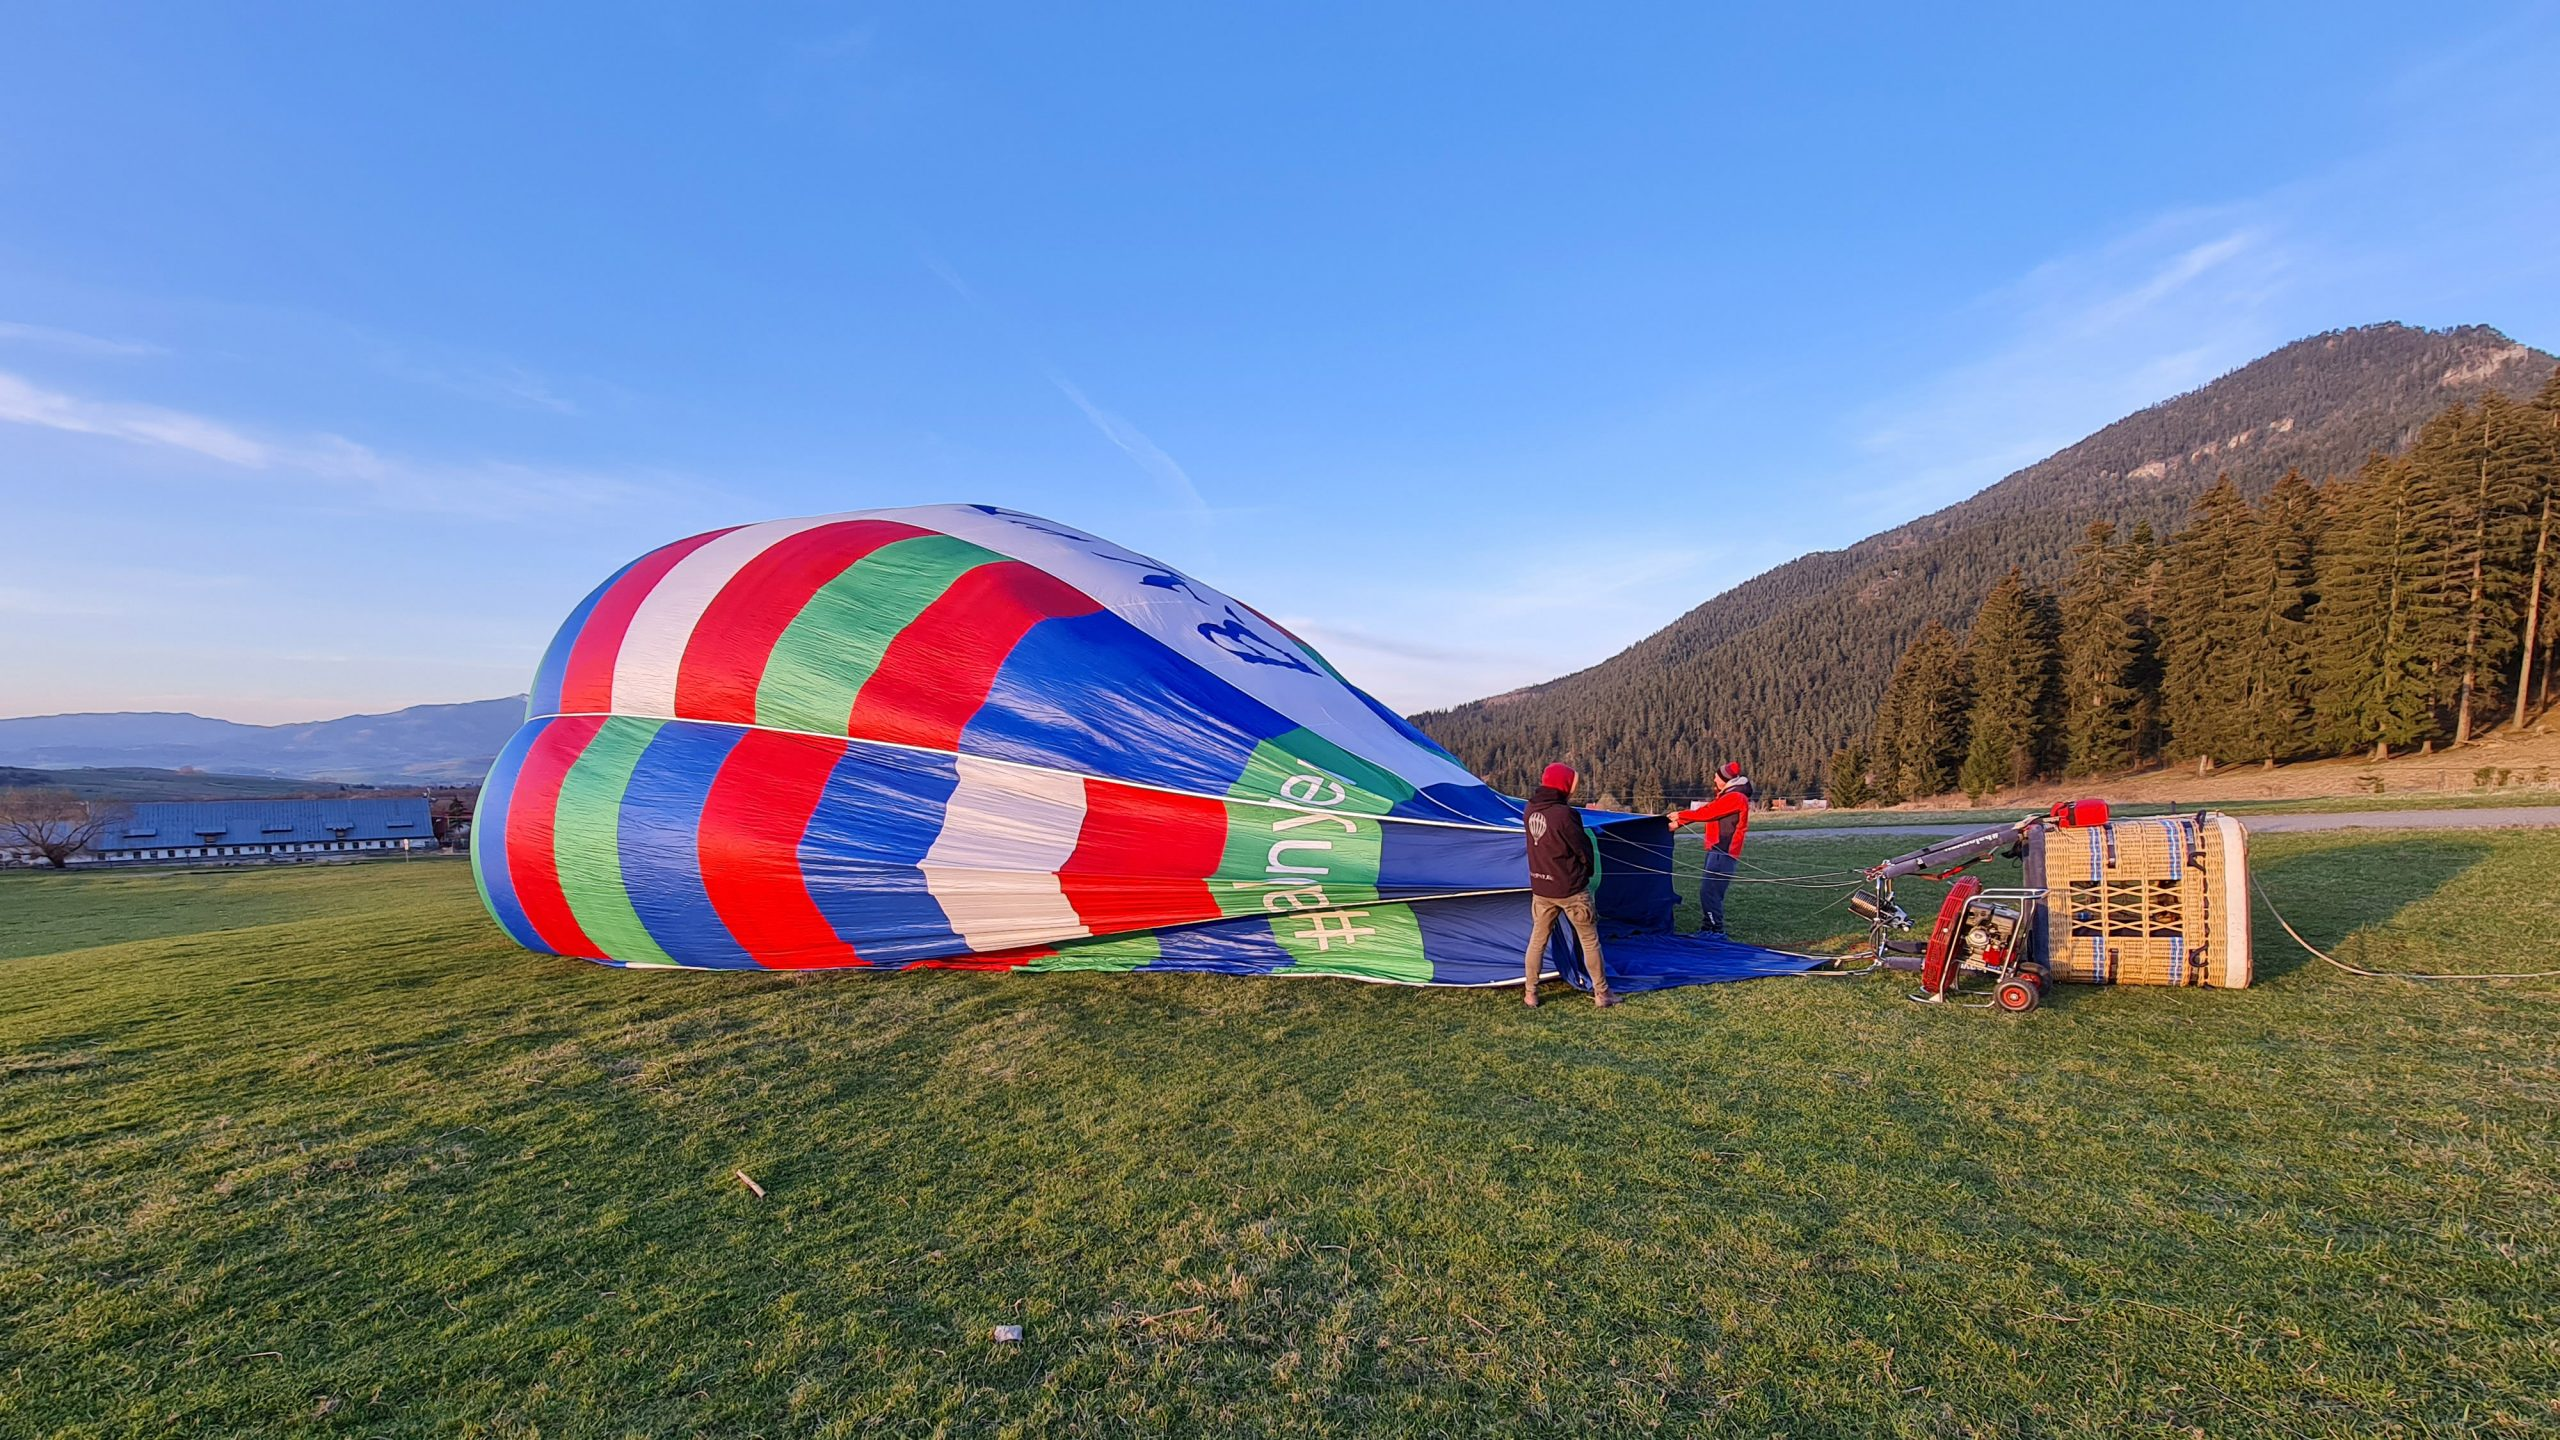 balon1 16x9 1 scaled